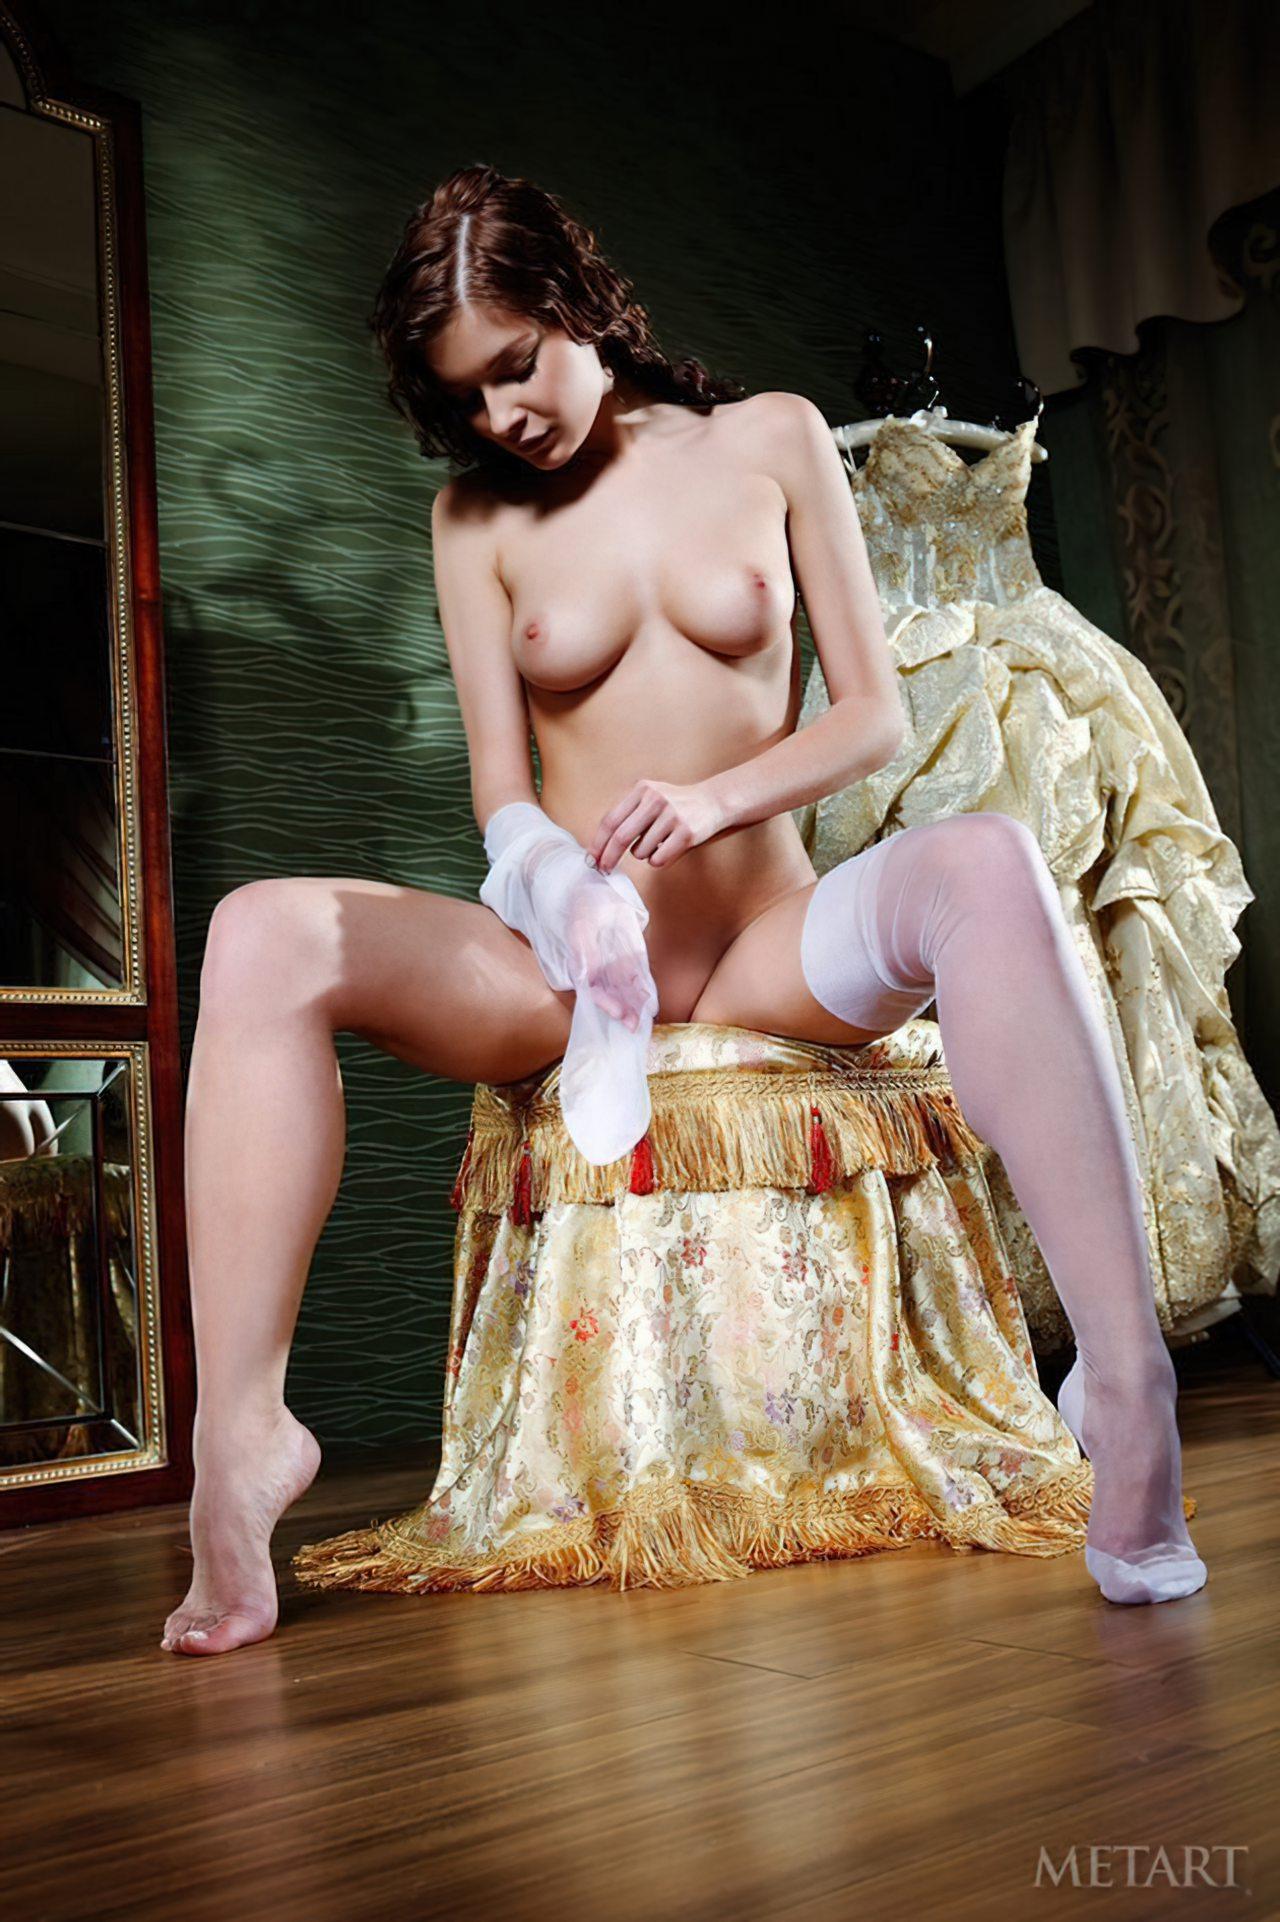 Novinha Vestindo Roupa (20)